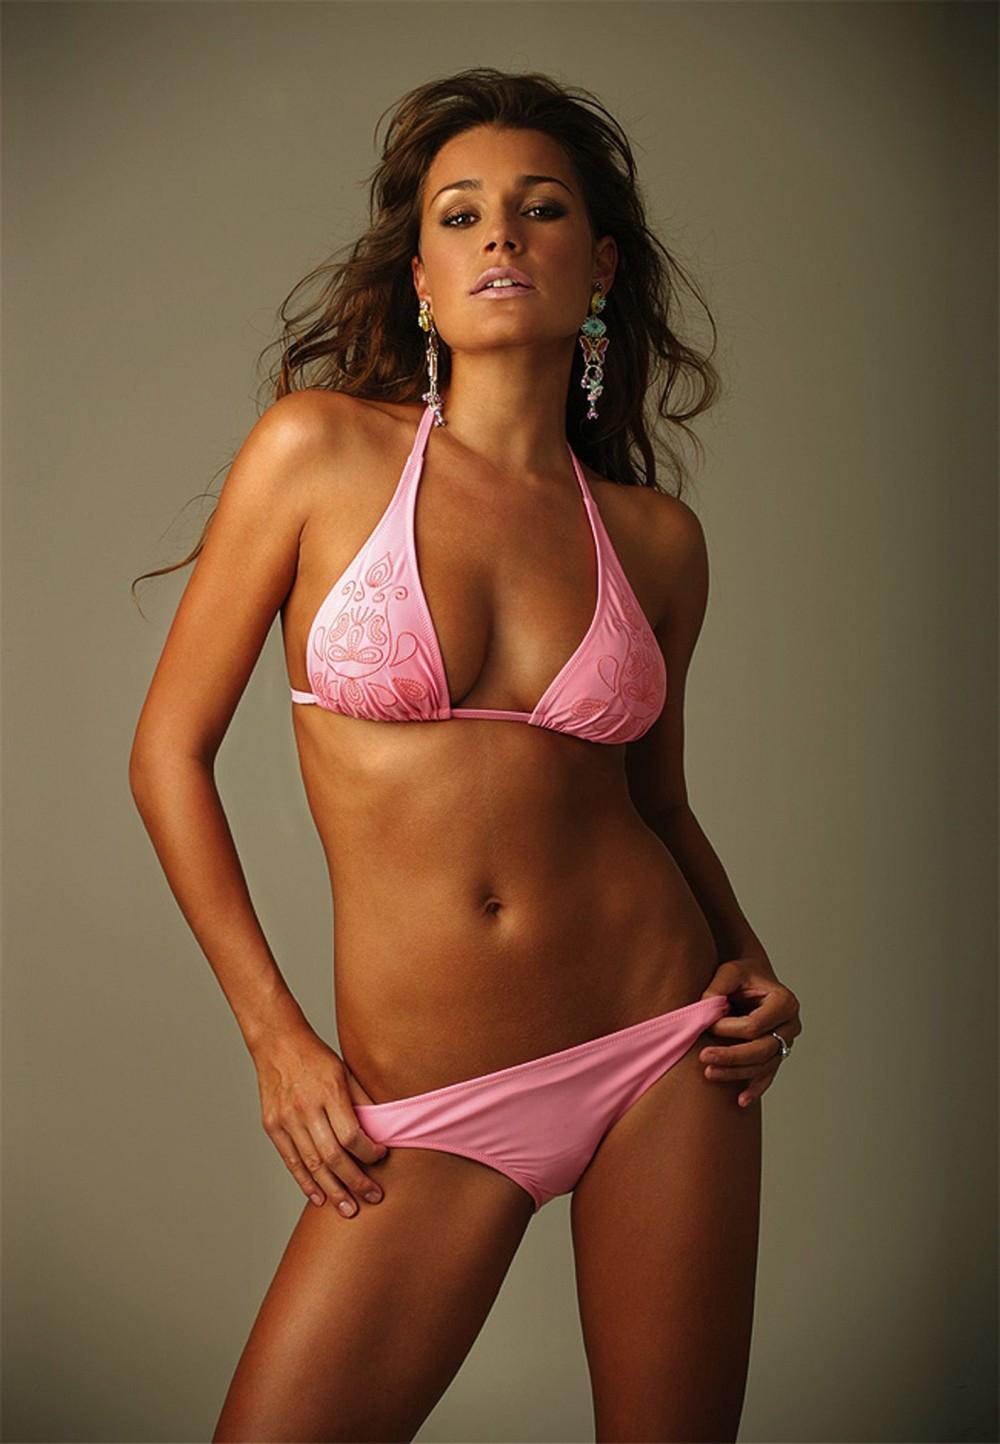 Alena Seredova est la femme du footballeur italien Gianluigi Buffon